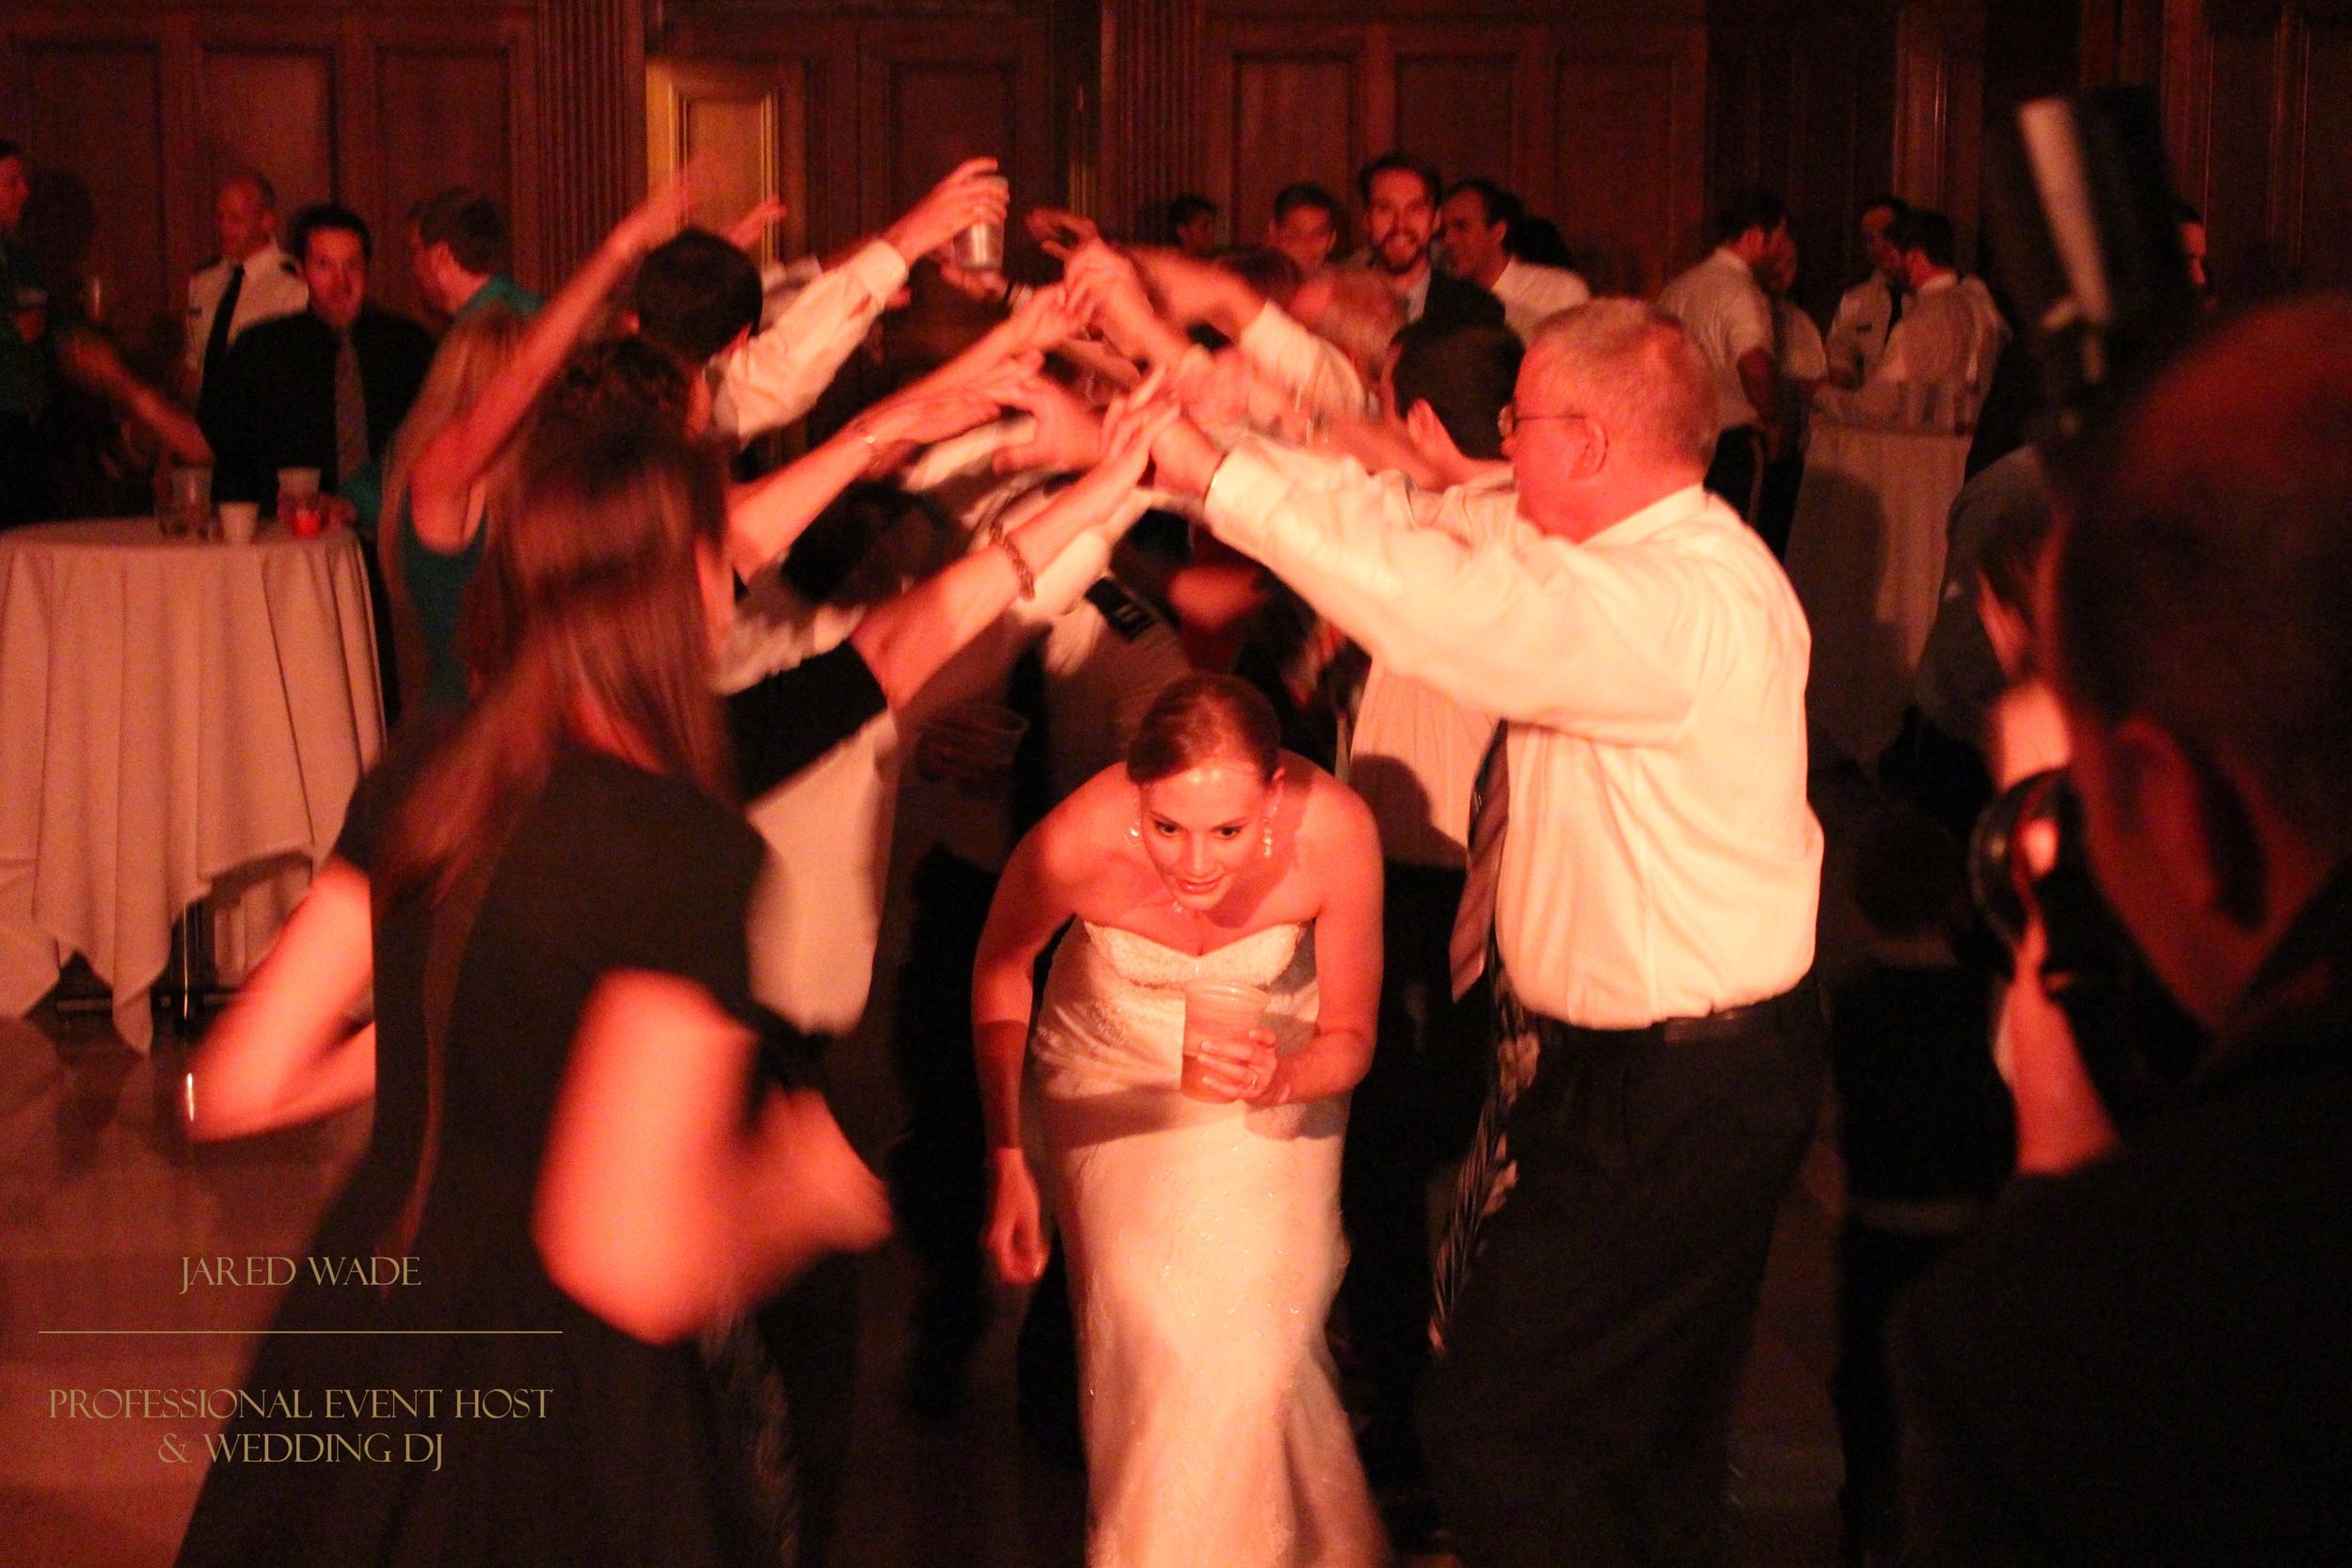 Jared Wade Professional Event Host | Indianapolis Wedding DJ | Indiana Wedding | Indiana War Memorial | Wedding Reception